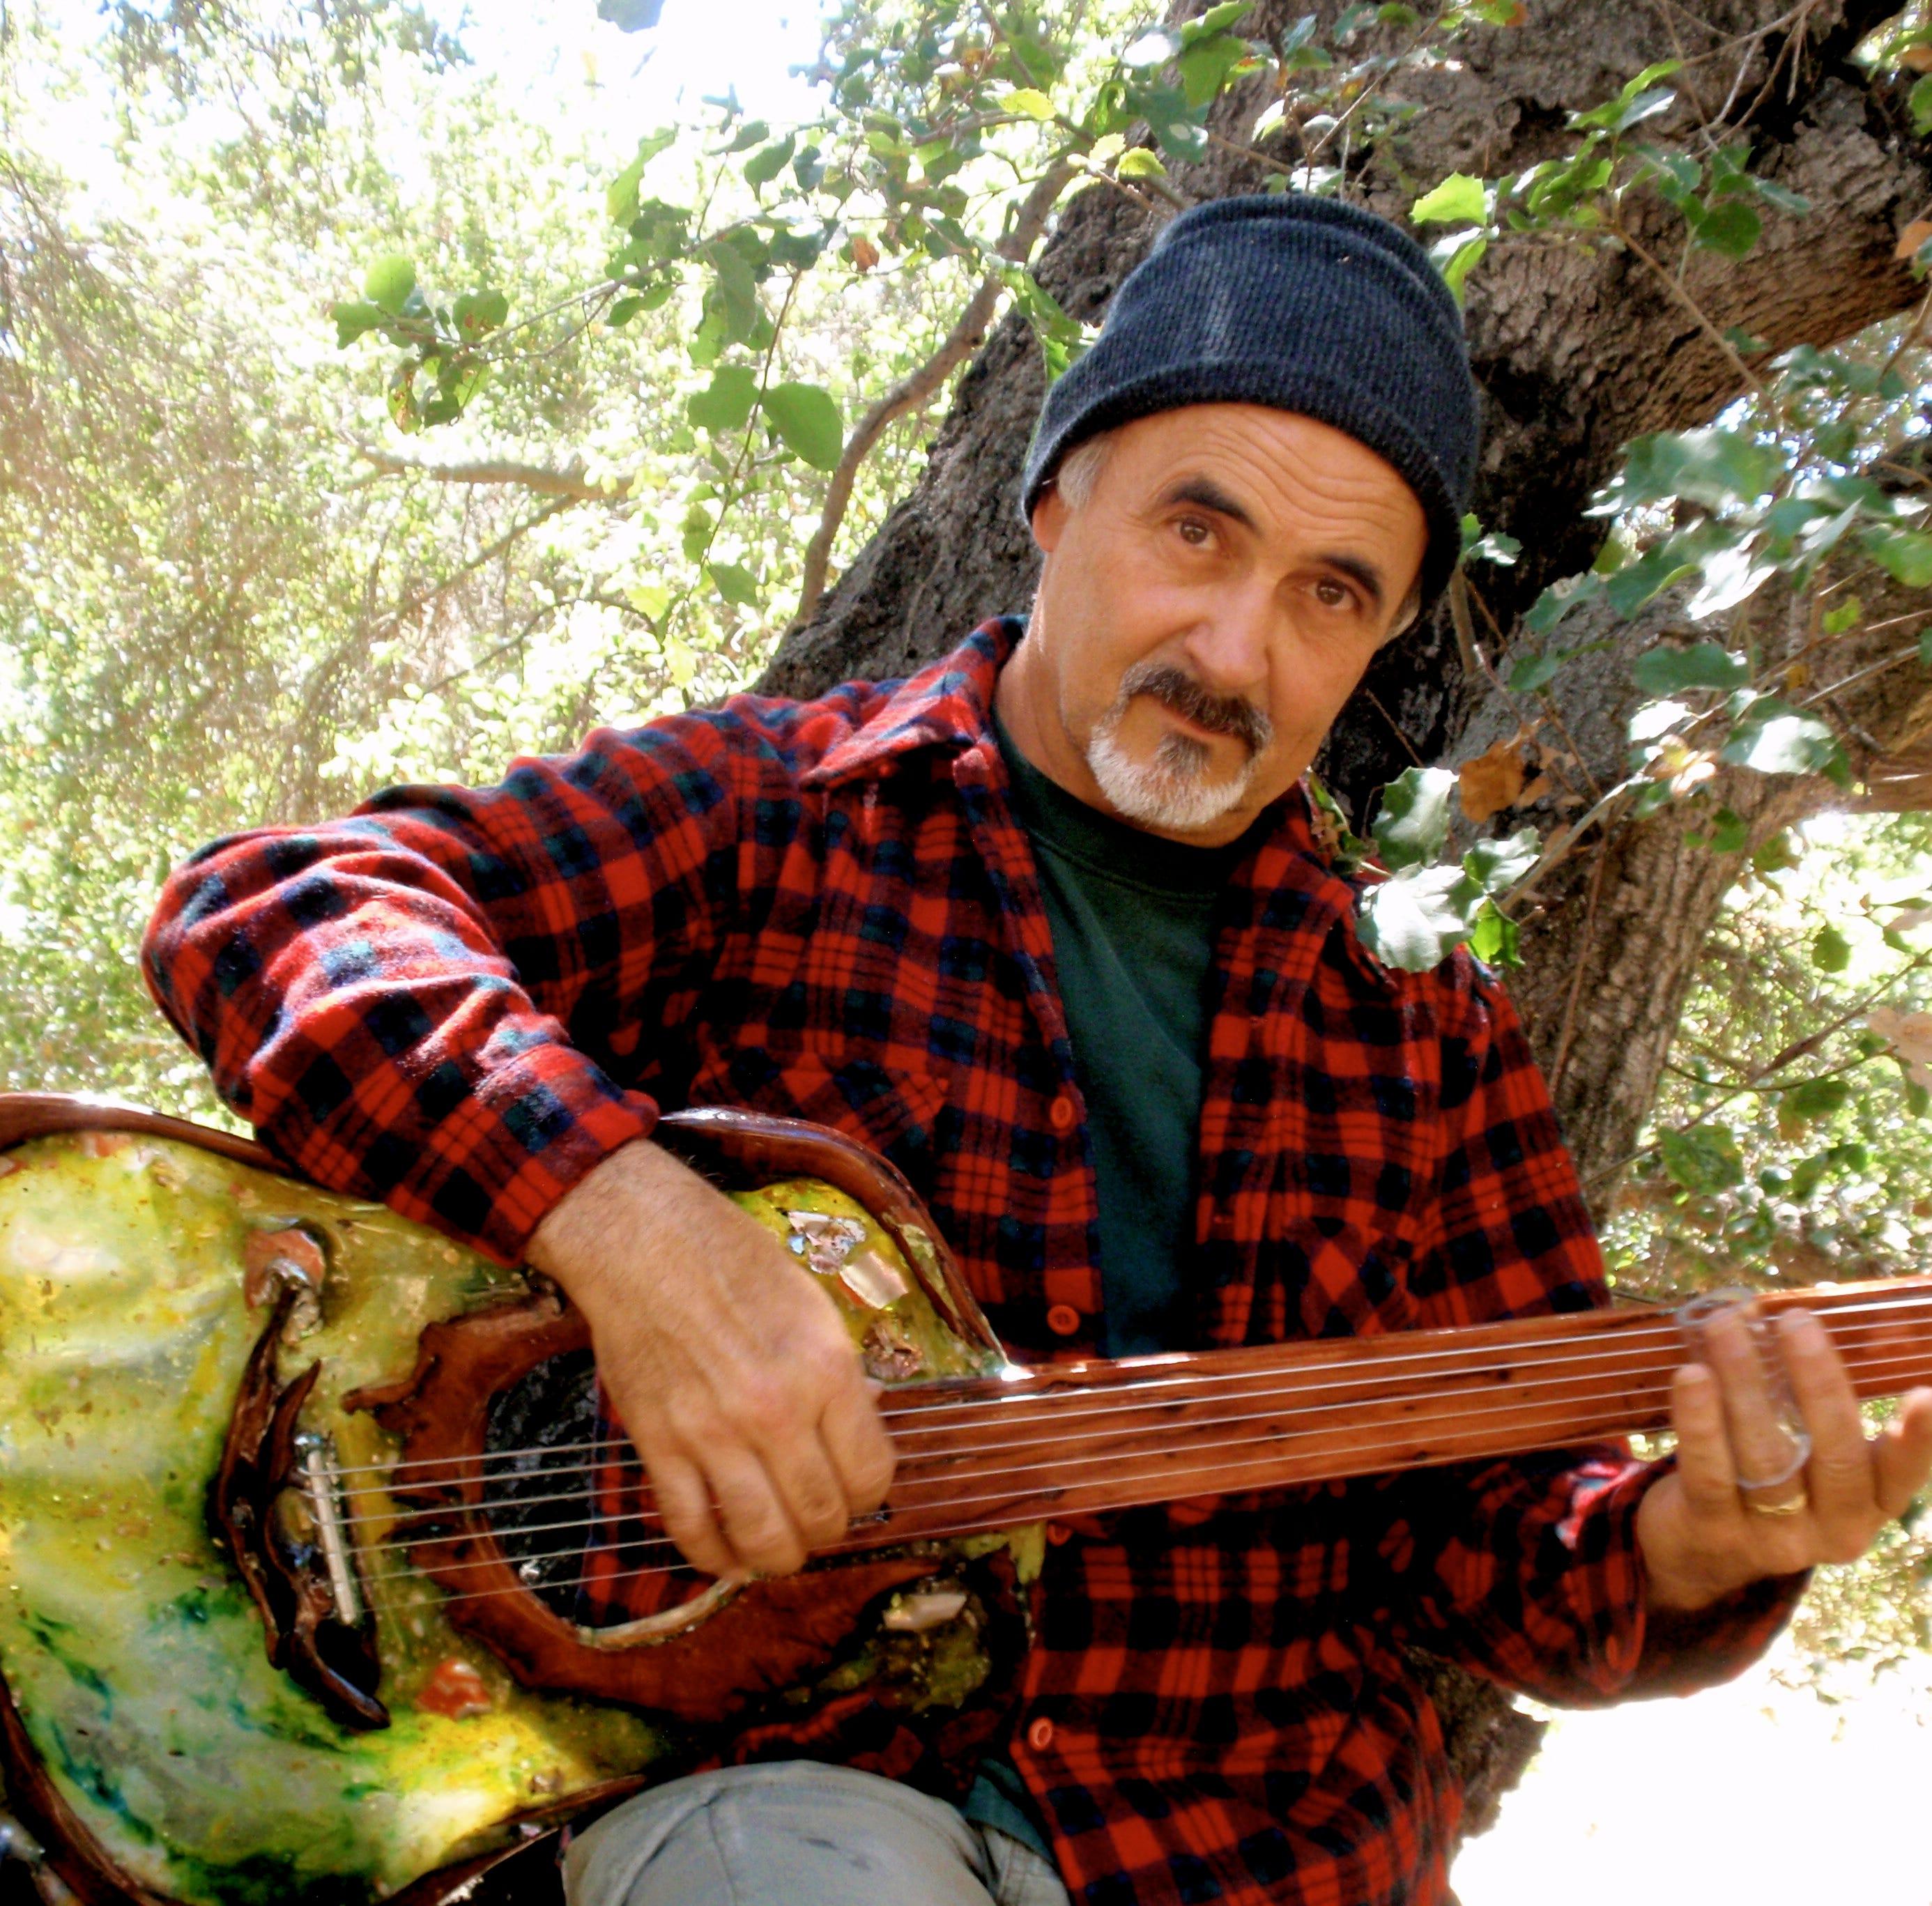 Folk music festival coming to Santa Paula on Saturday